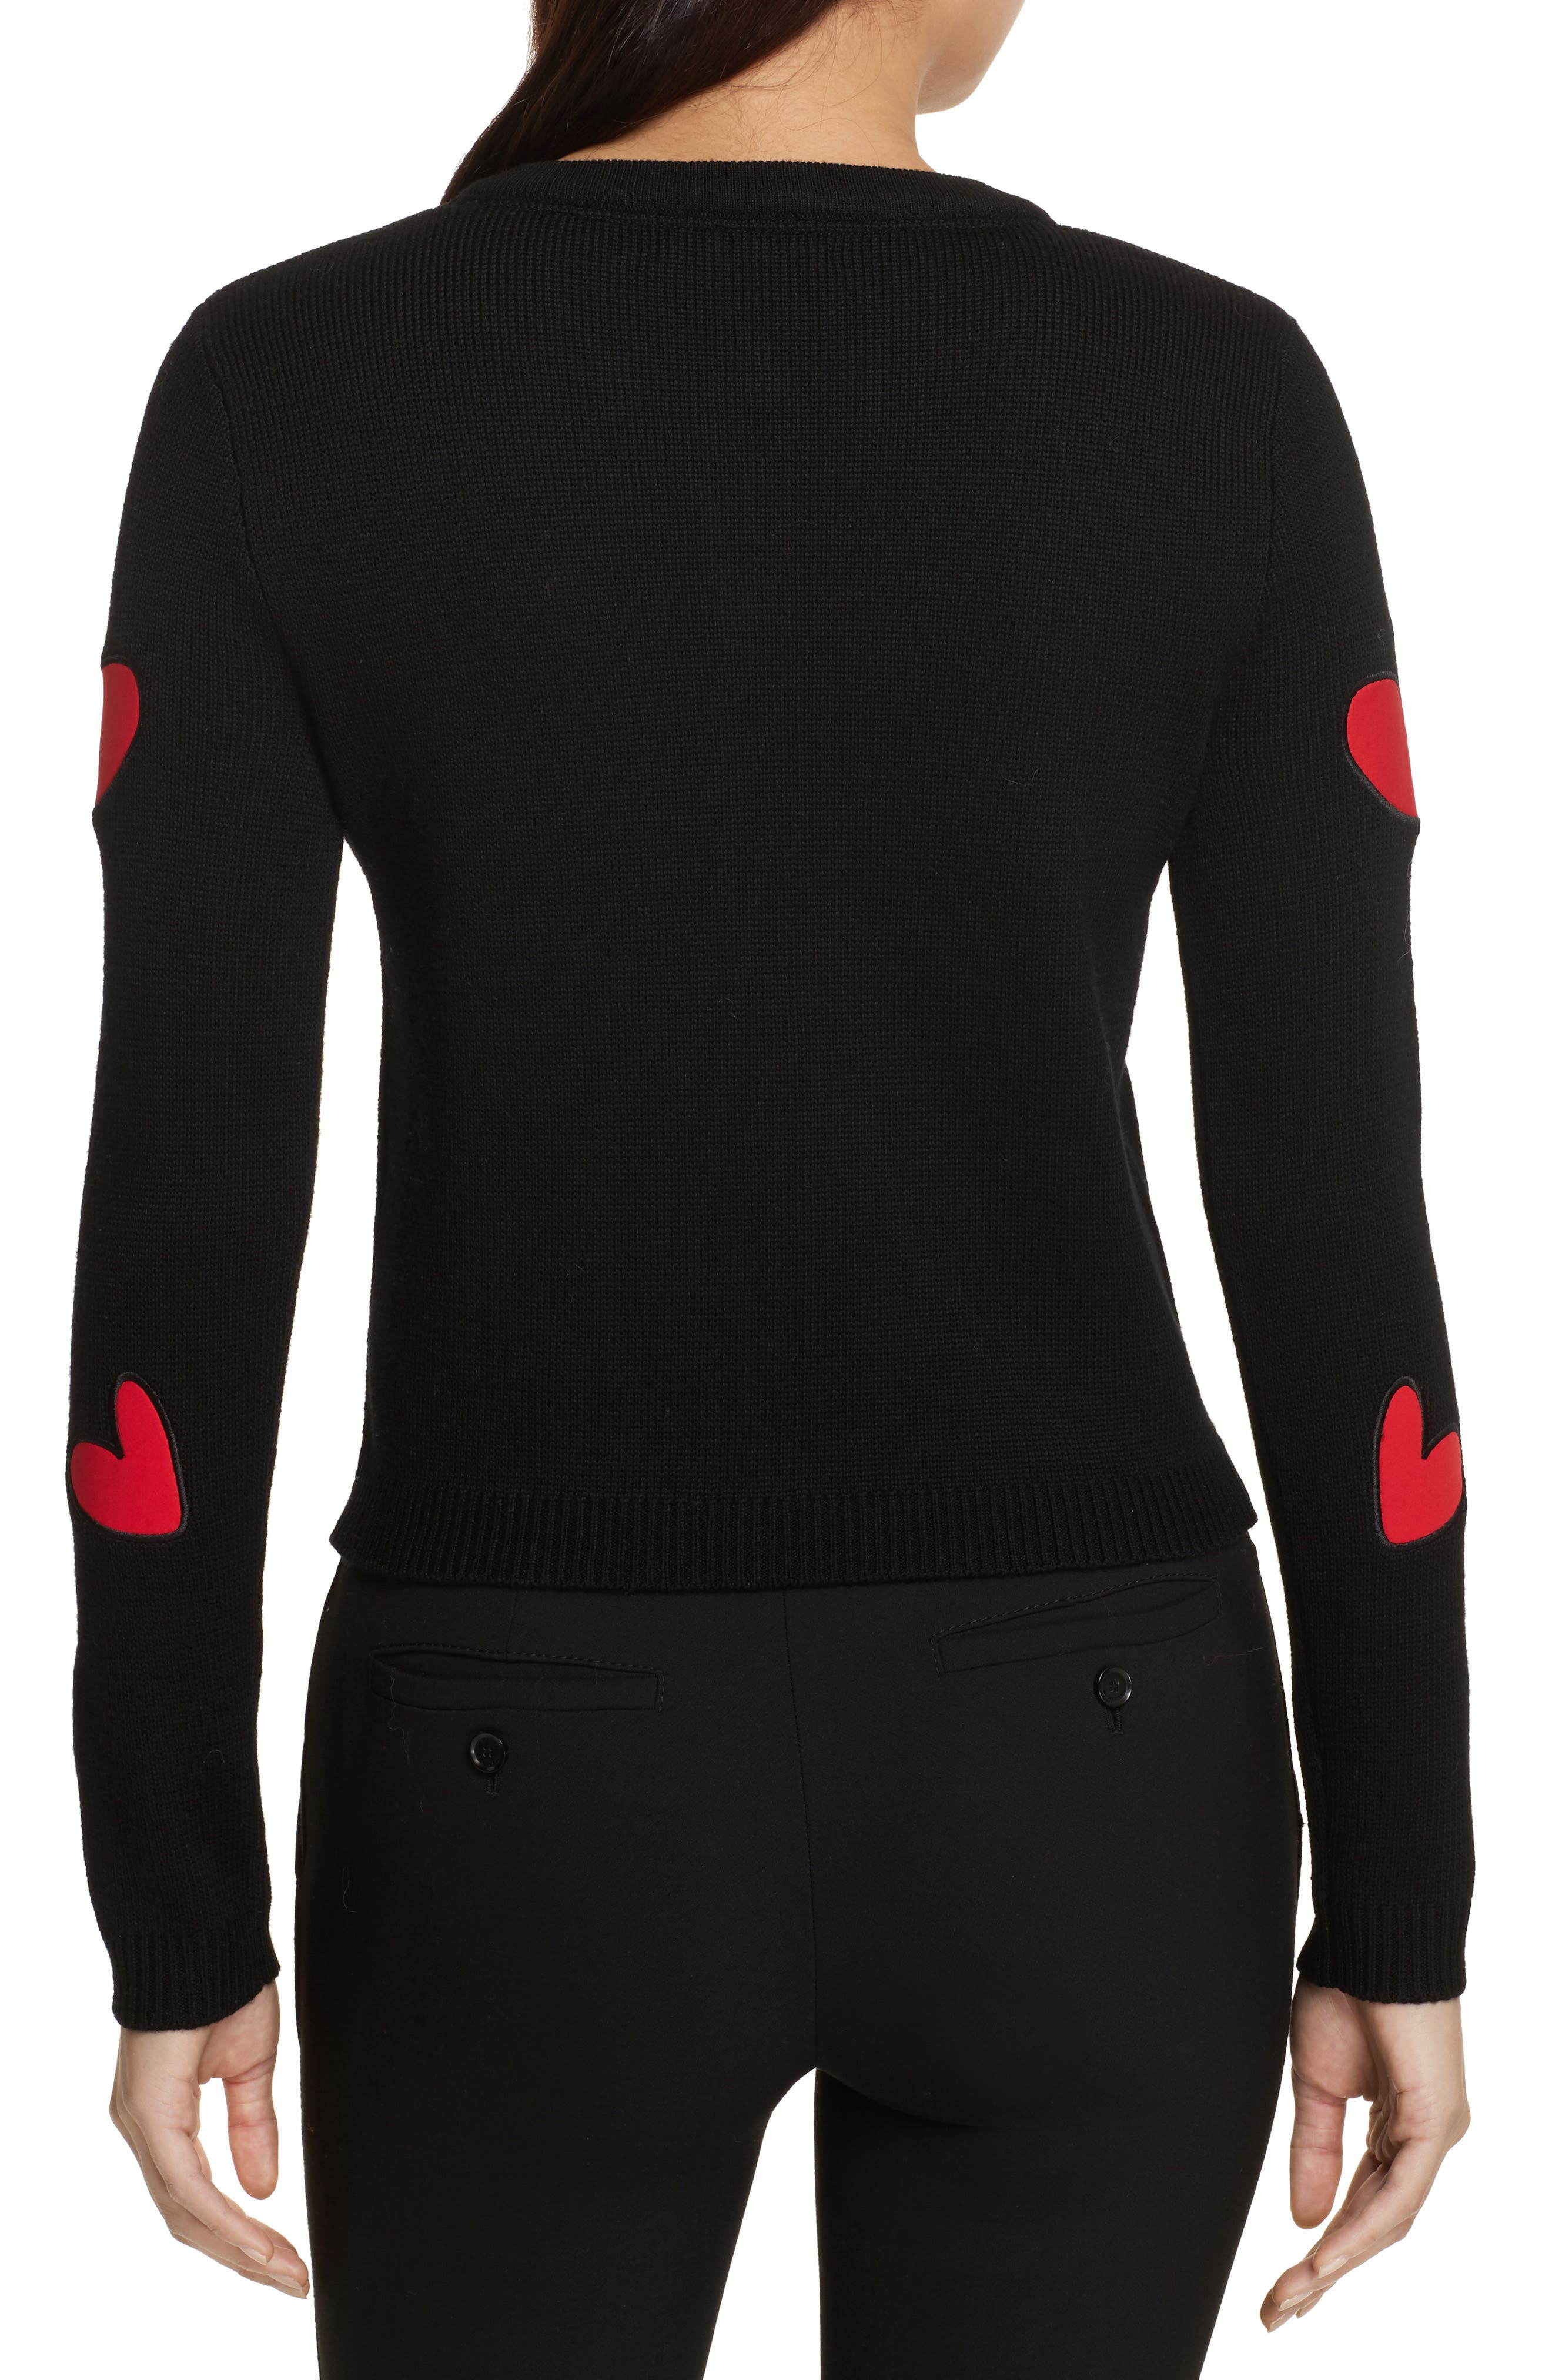 Ruthy Heart Appliqué Cardigan,                             Alternate thumbnail 2, color,                             Black/ Apple